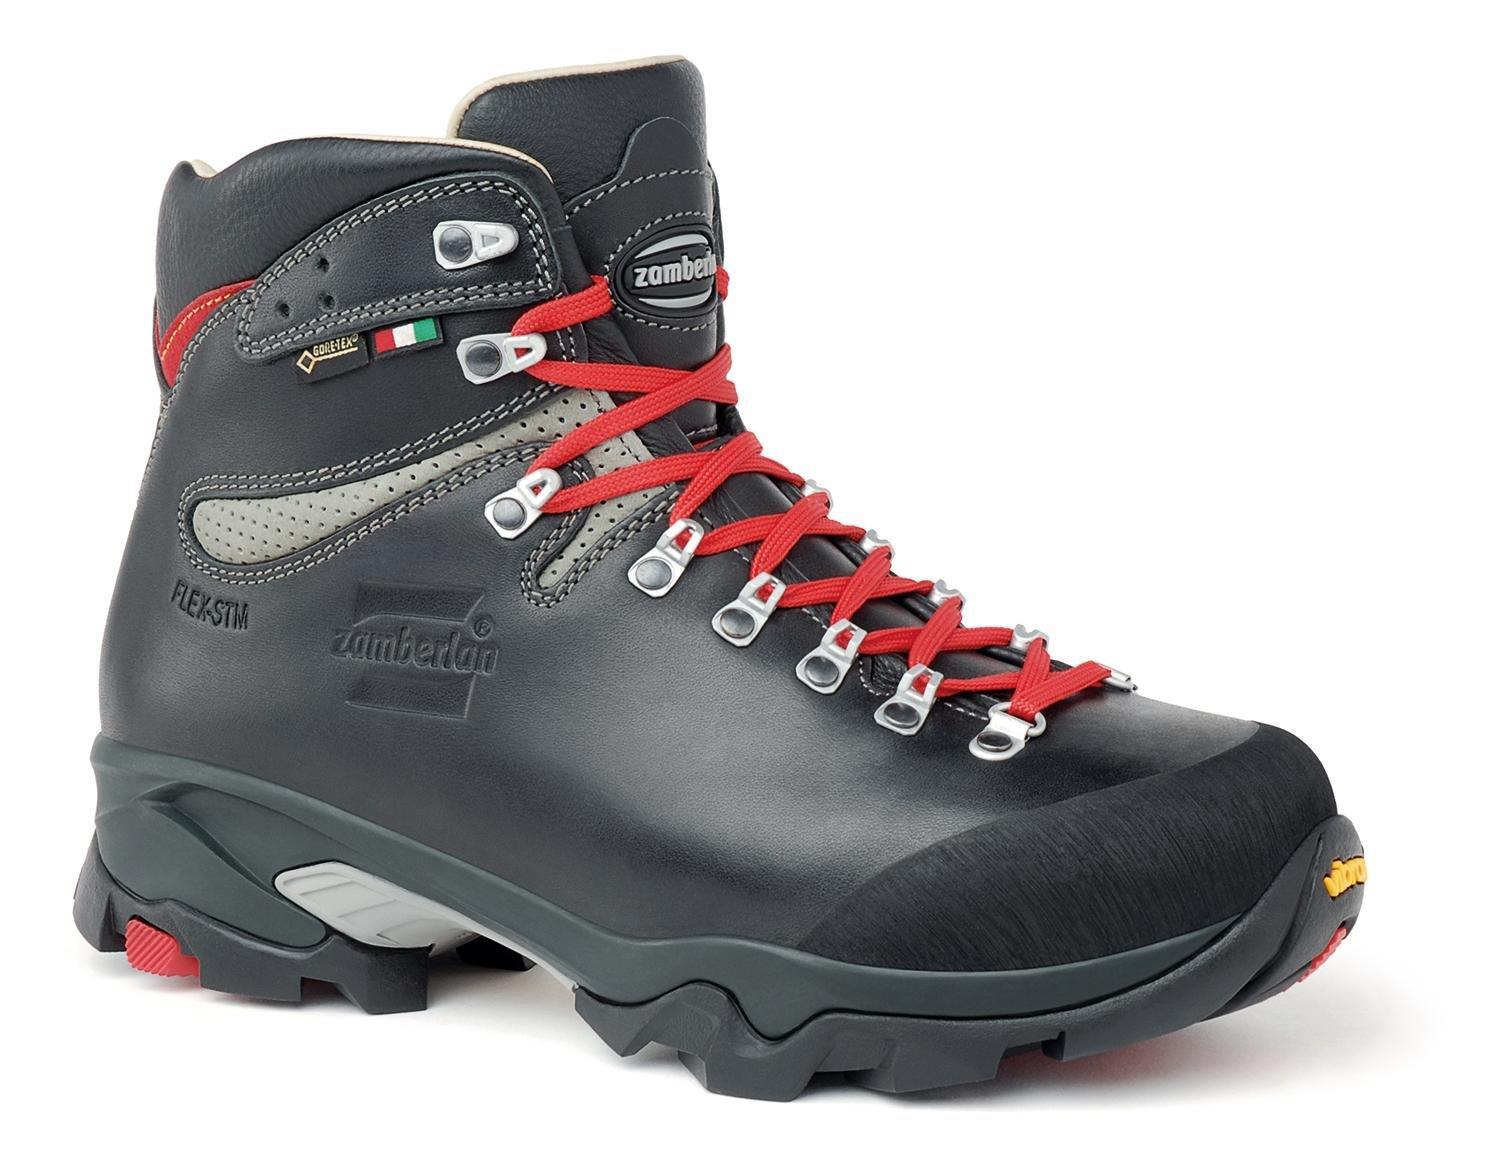 Zamberlan - 1996 VIOZ lux GTX rr - Leather Backcountry Boots - Waxed Black - 9.5 by Zamberlan